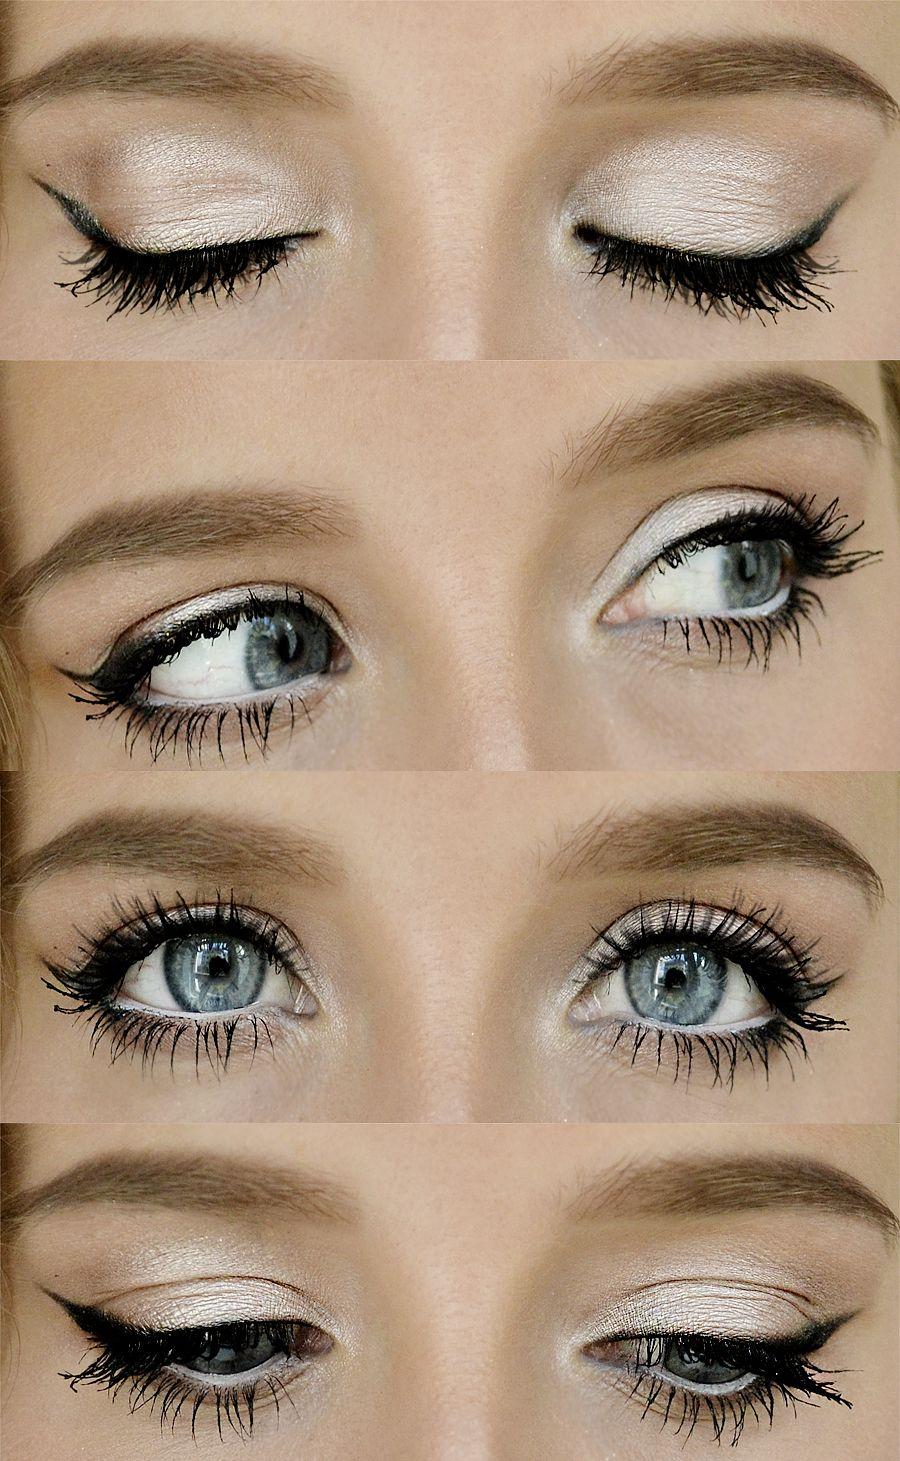 Barbie Mutation: Requested light makeup